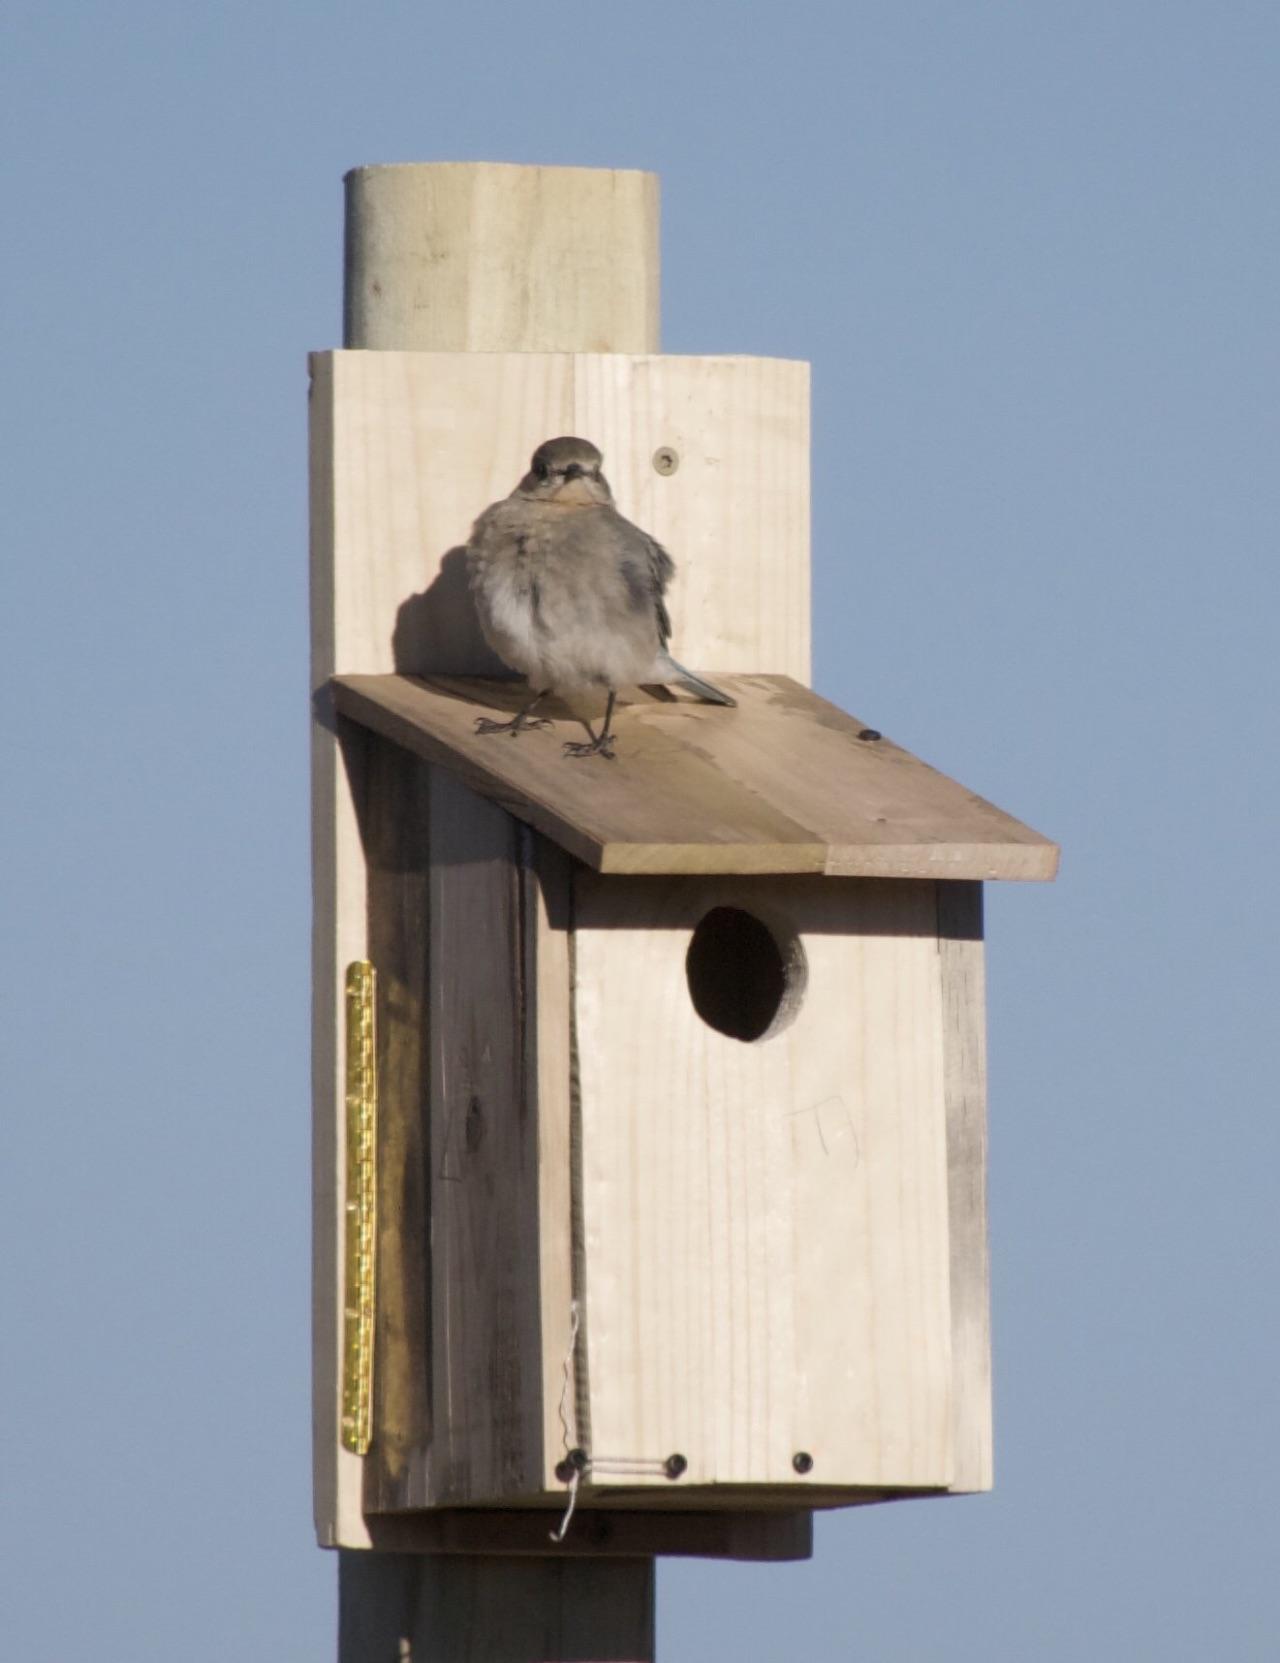 Female bluebird sitting on the birdhouse